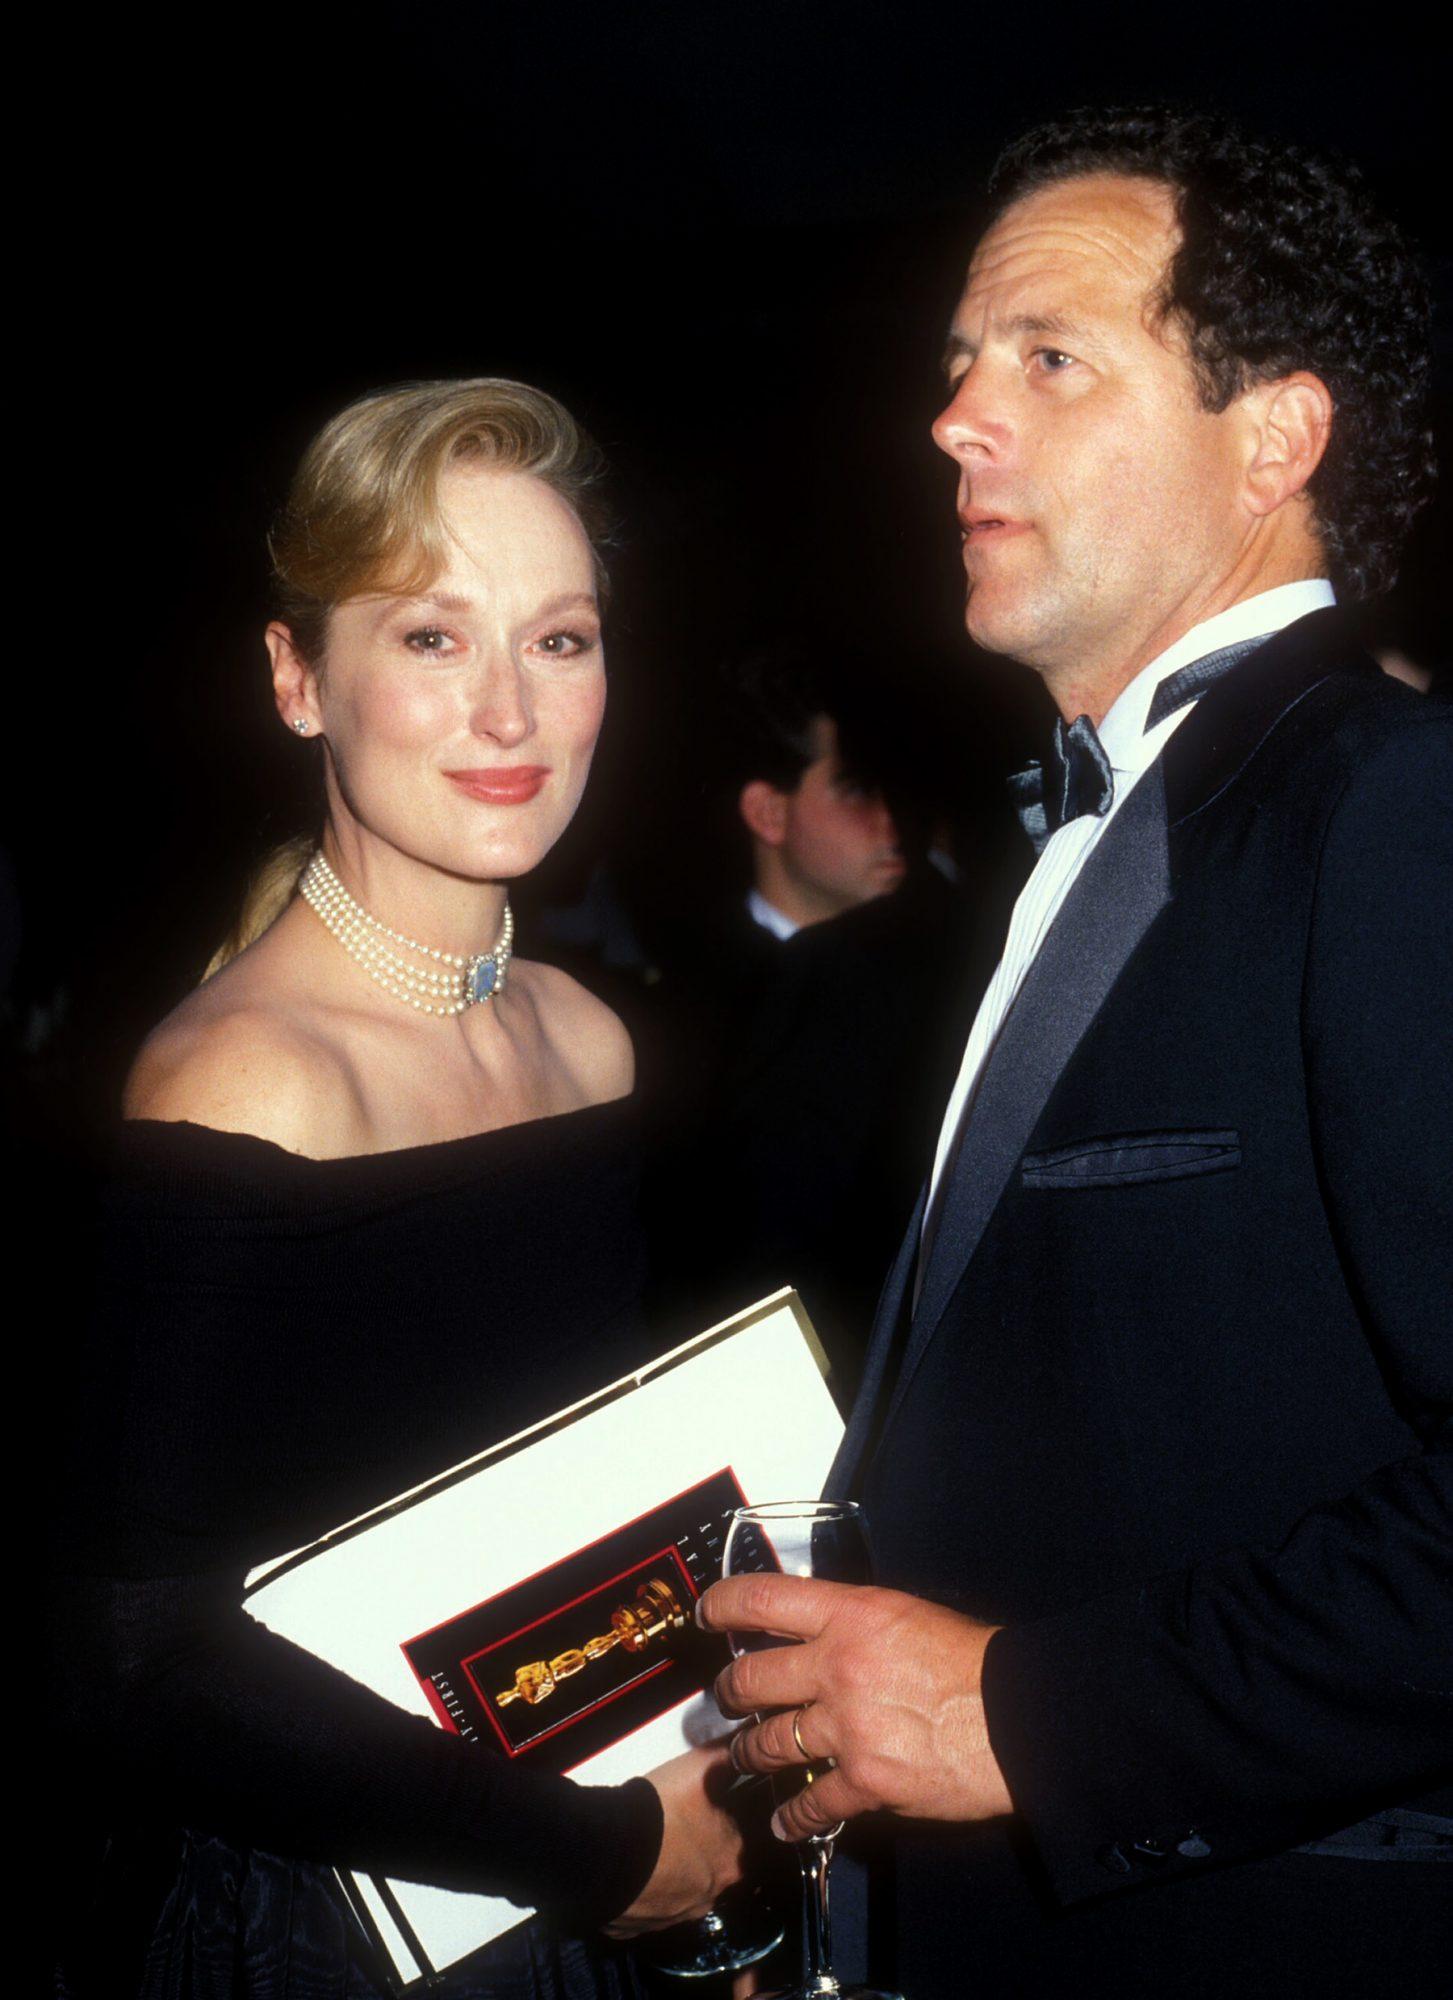 61st Annual Academy Awards - Governor's Ball